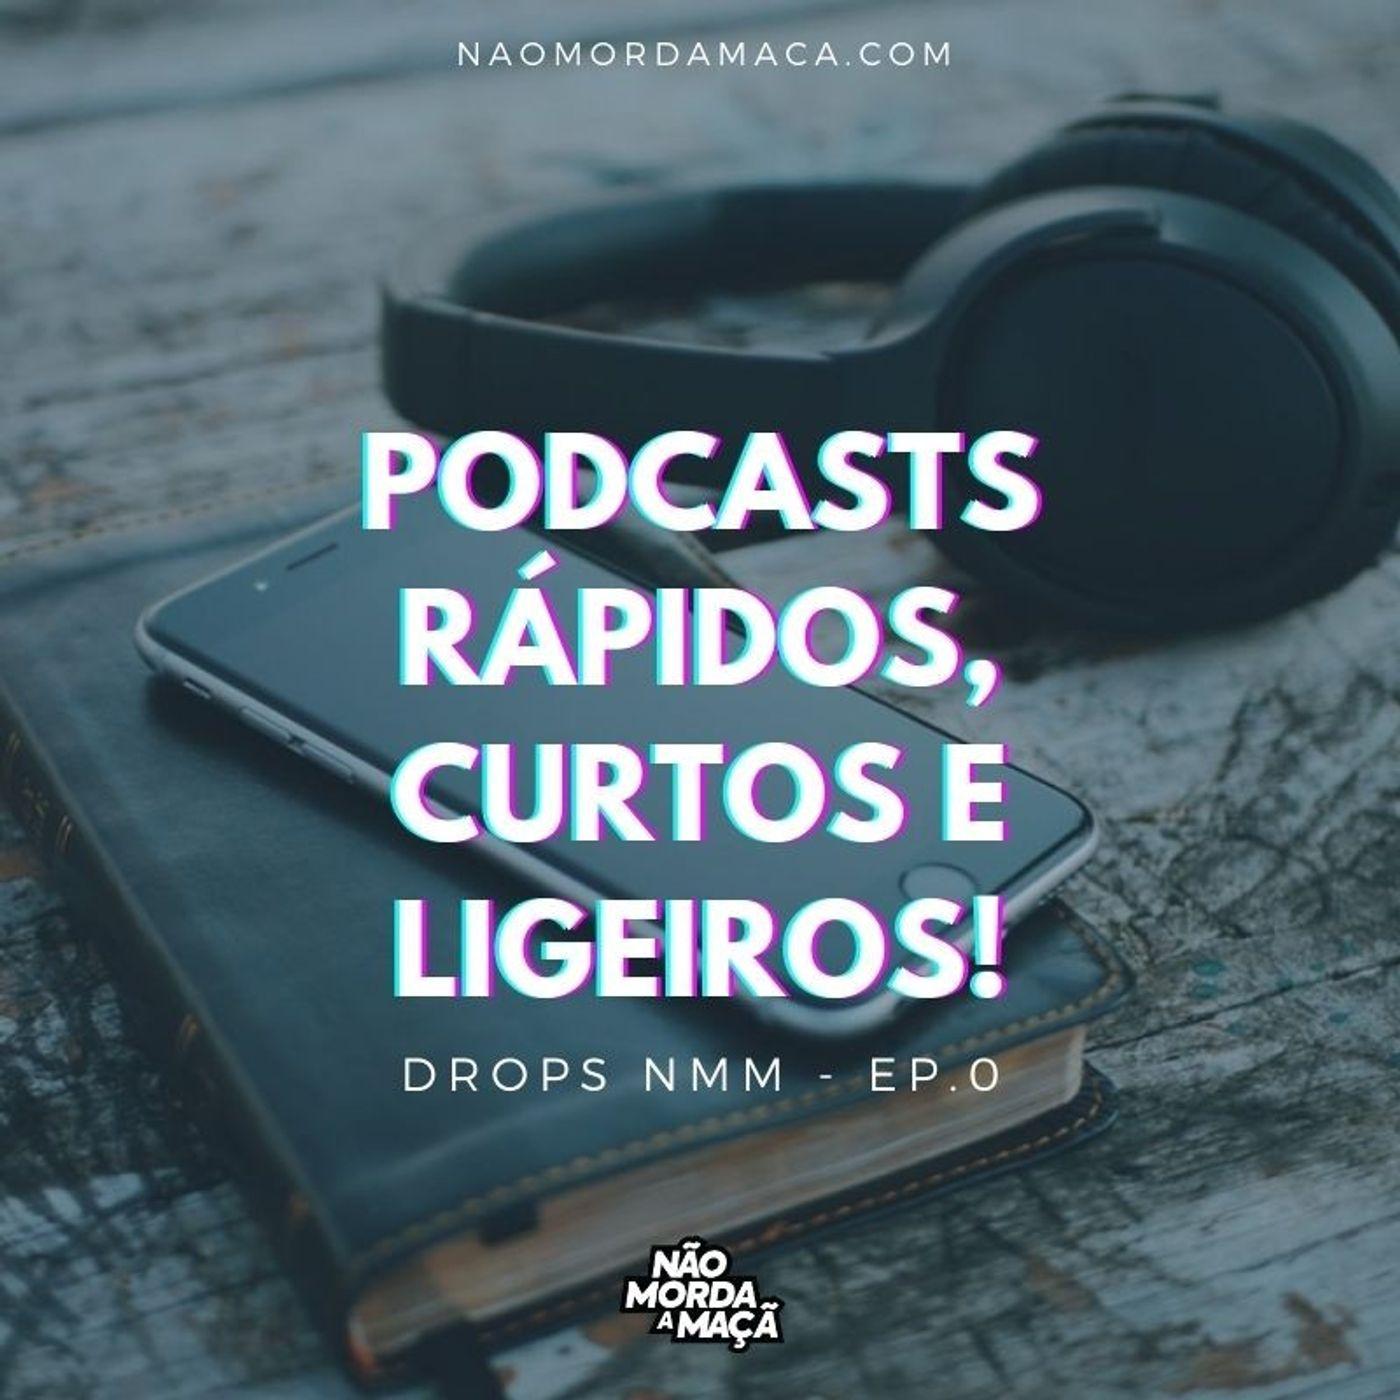 Podcasts rápidos, curtos e ligeiros!